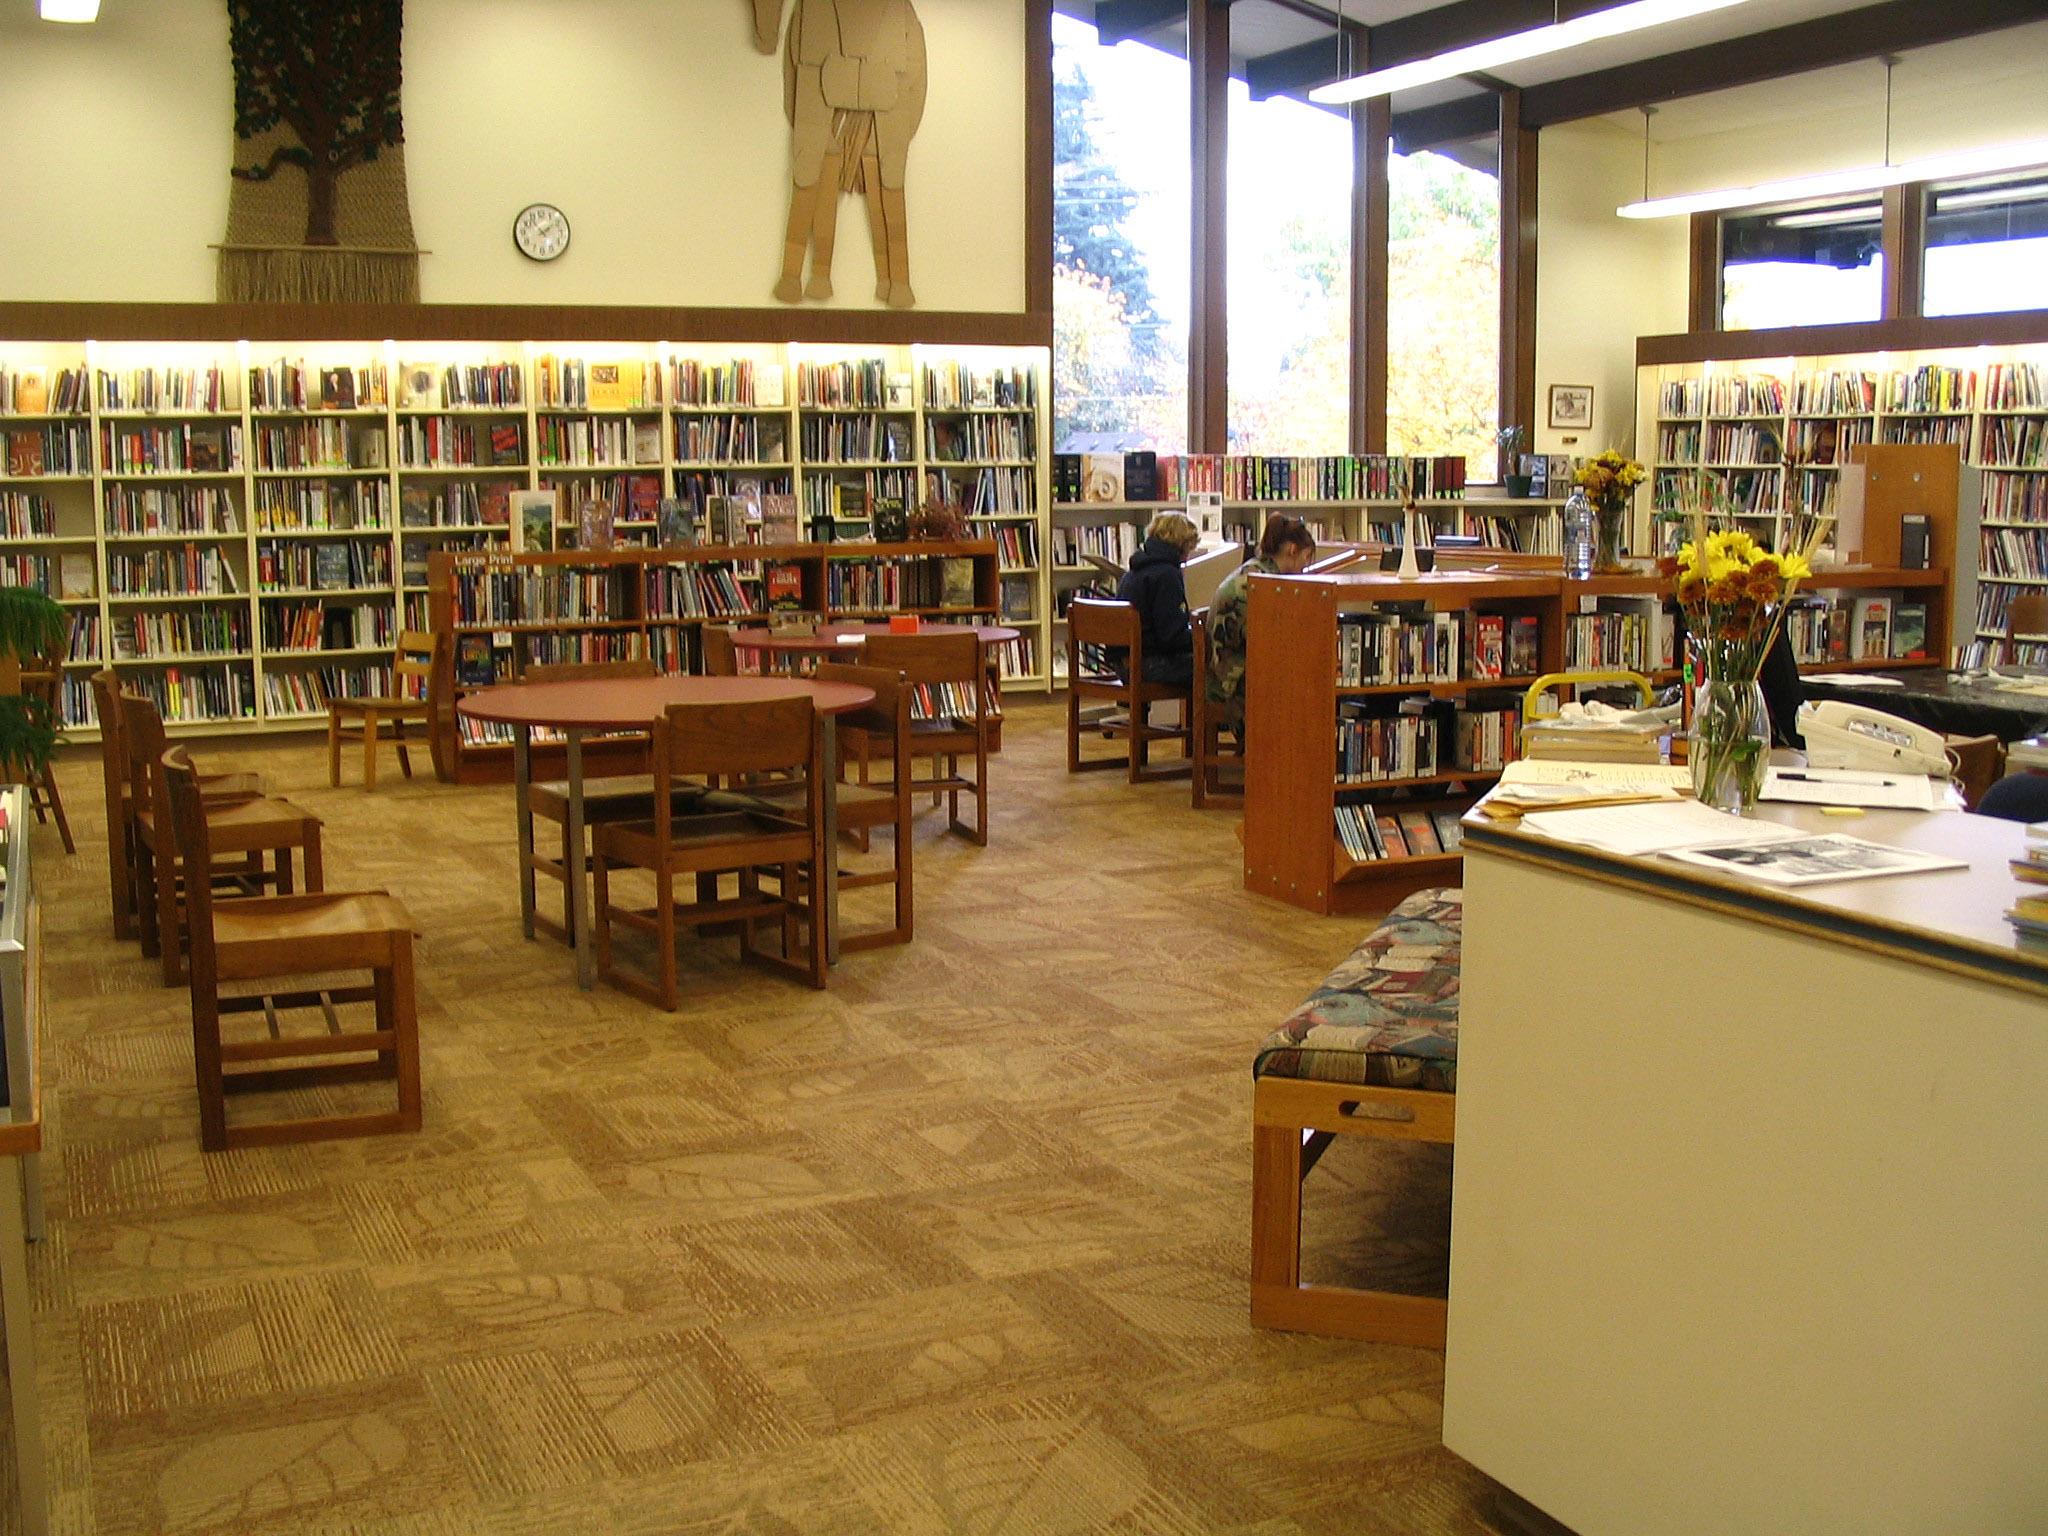 Description Stevenson Washington public library interior.jpg